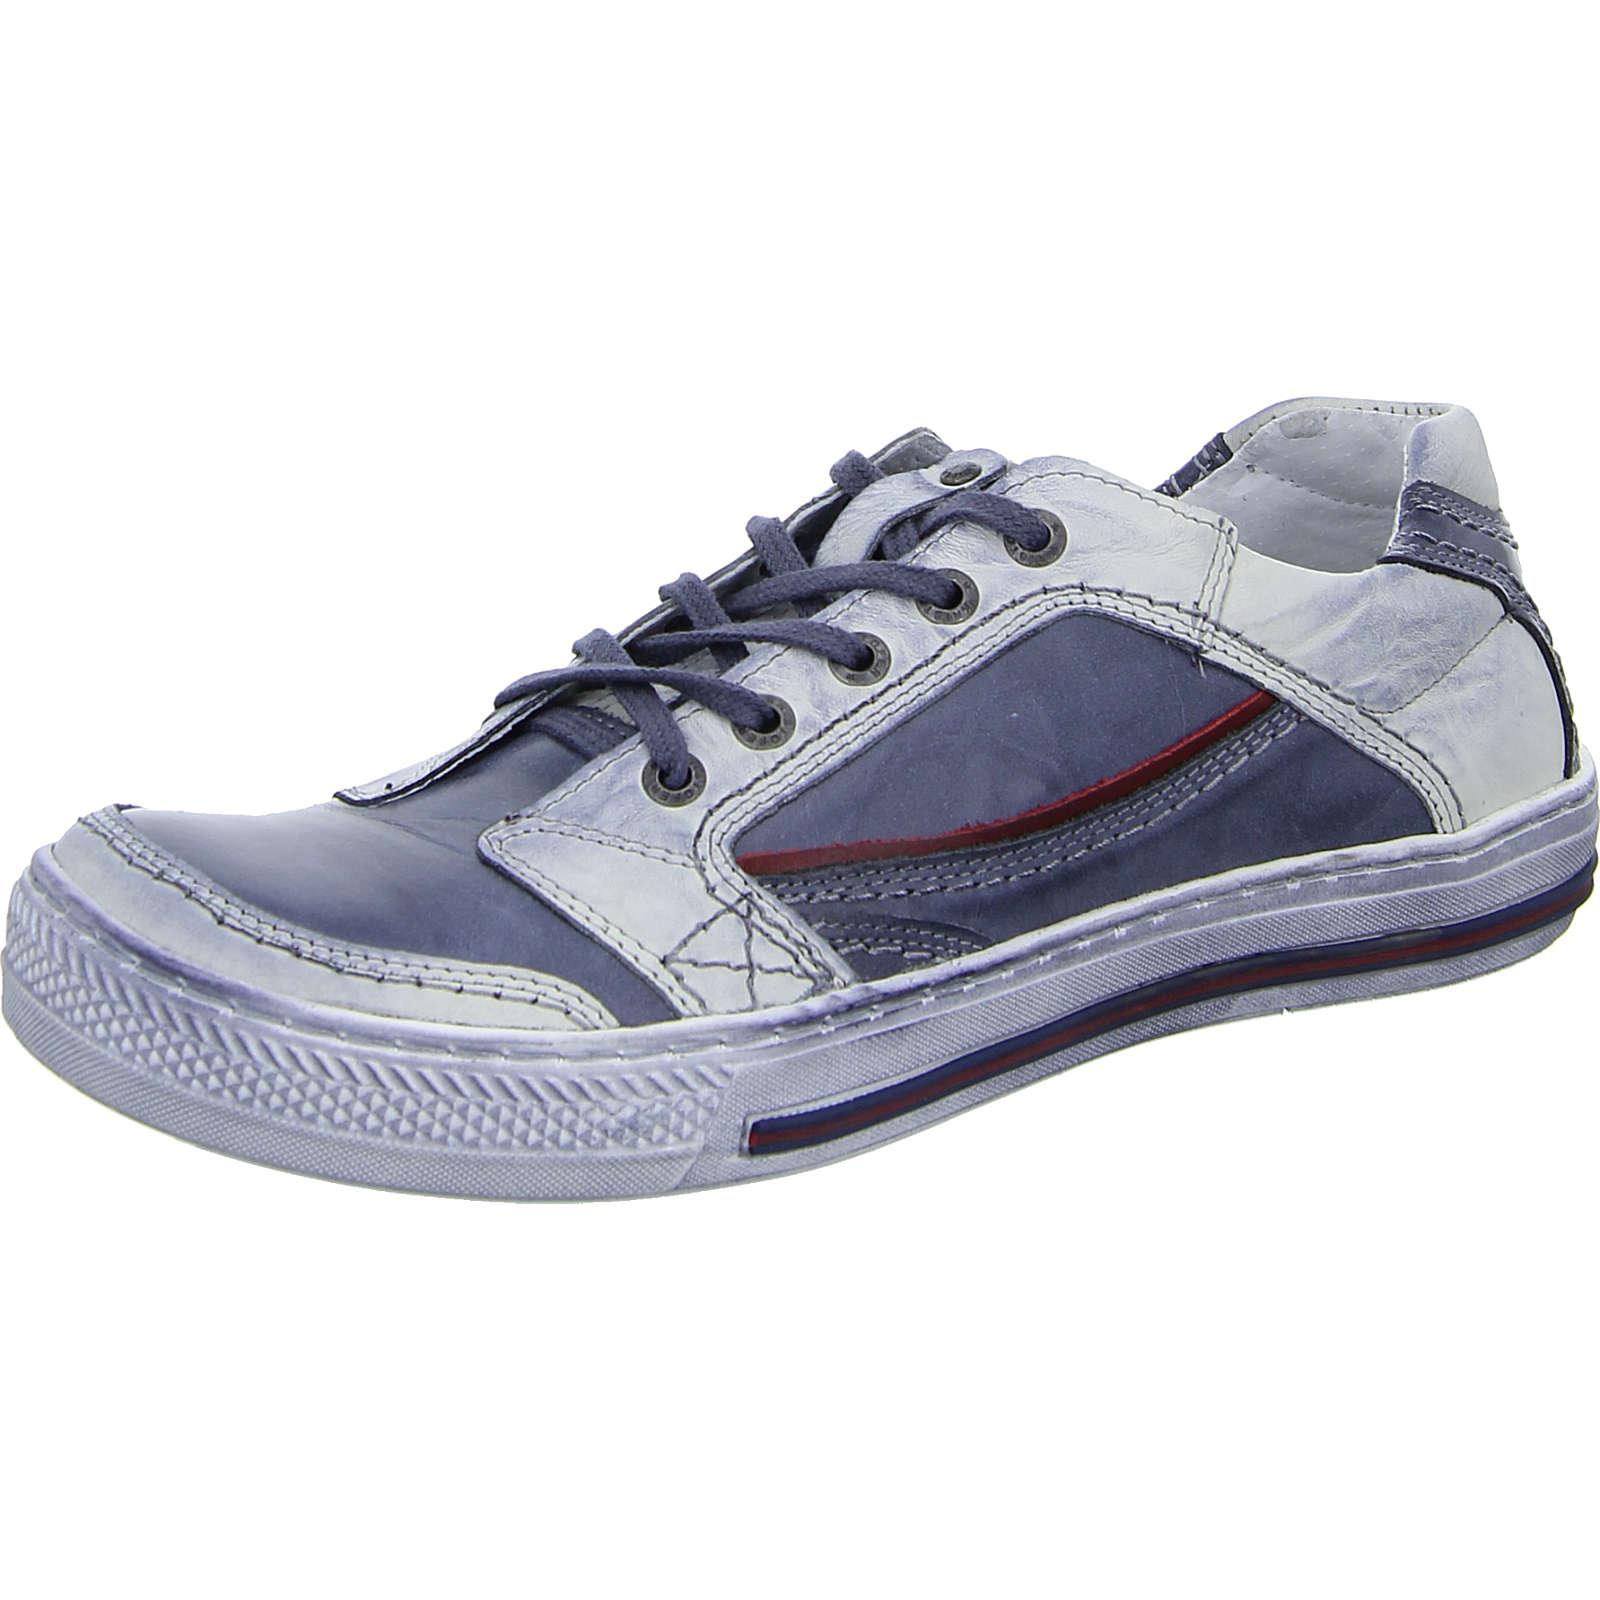 Kristofer Sneakers blau Herren Gr. 45